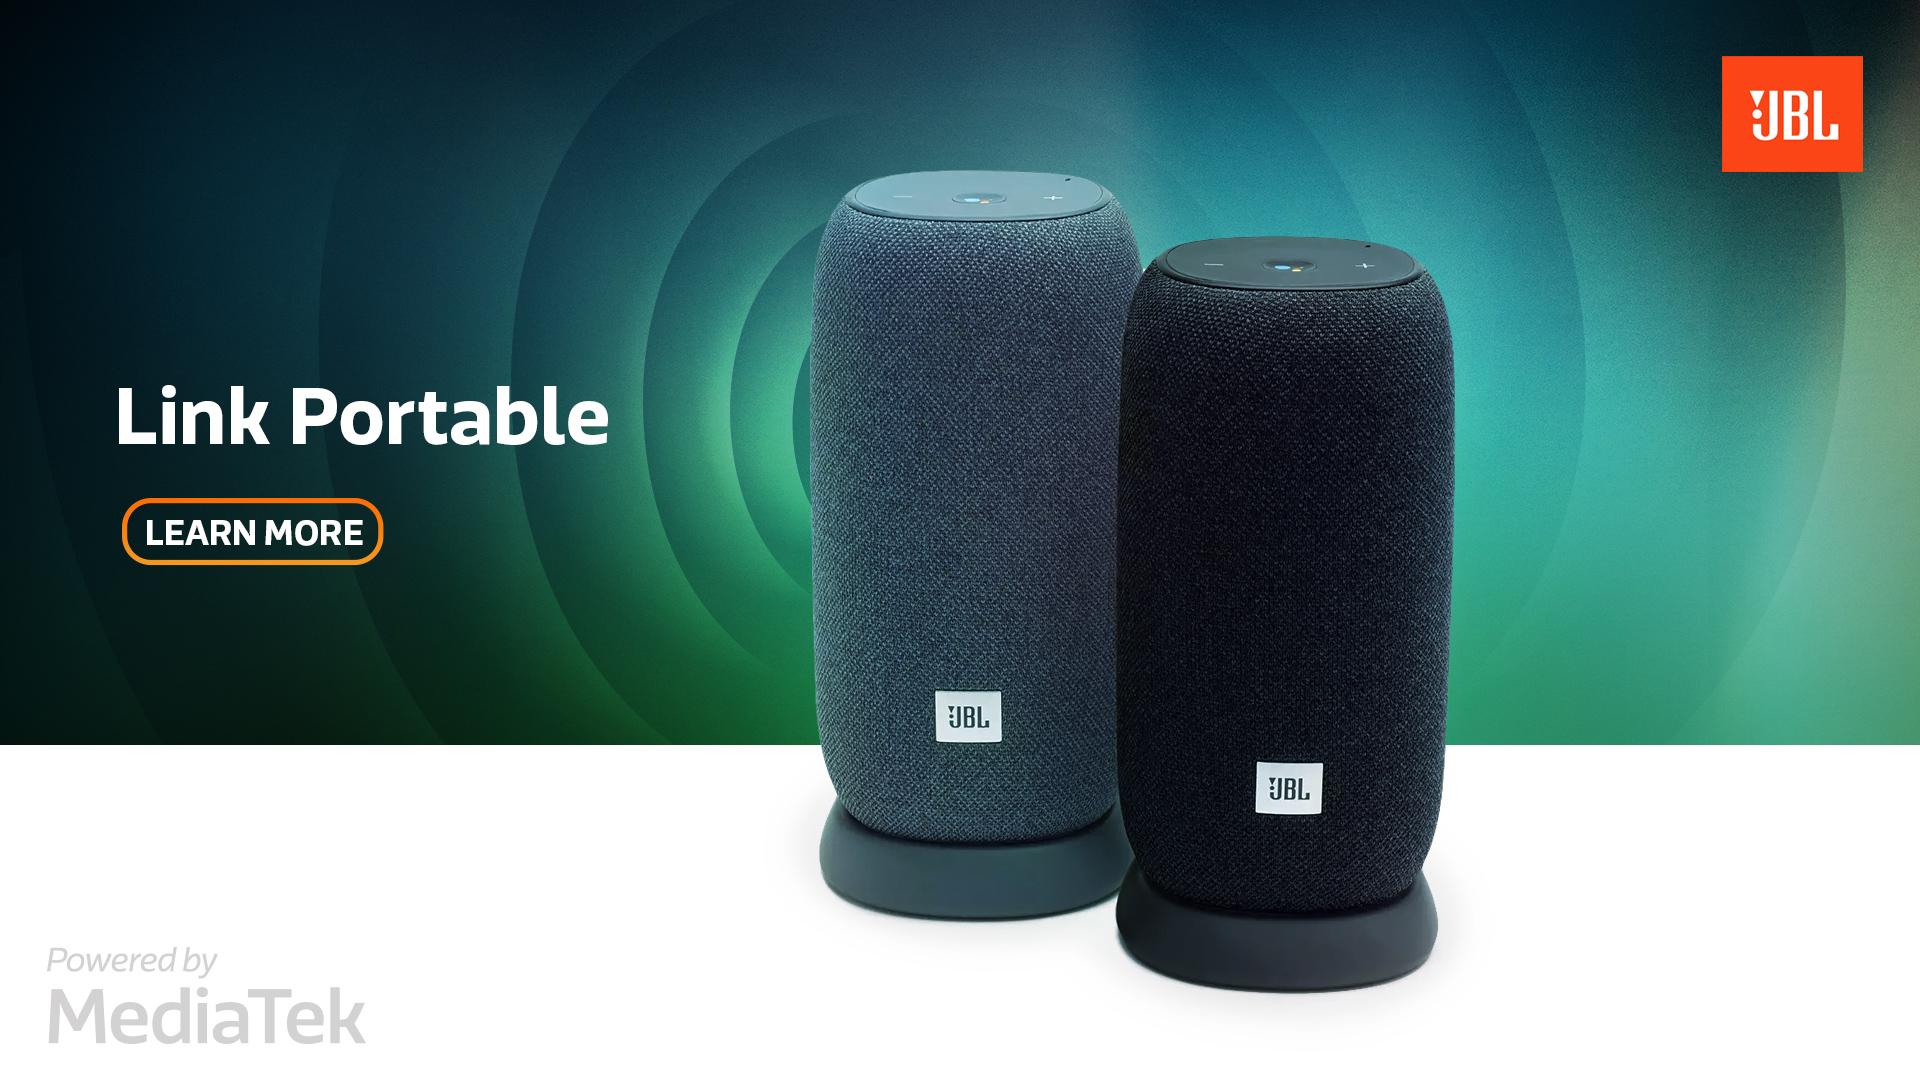 JBL_Link-Portable-1